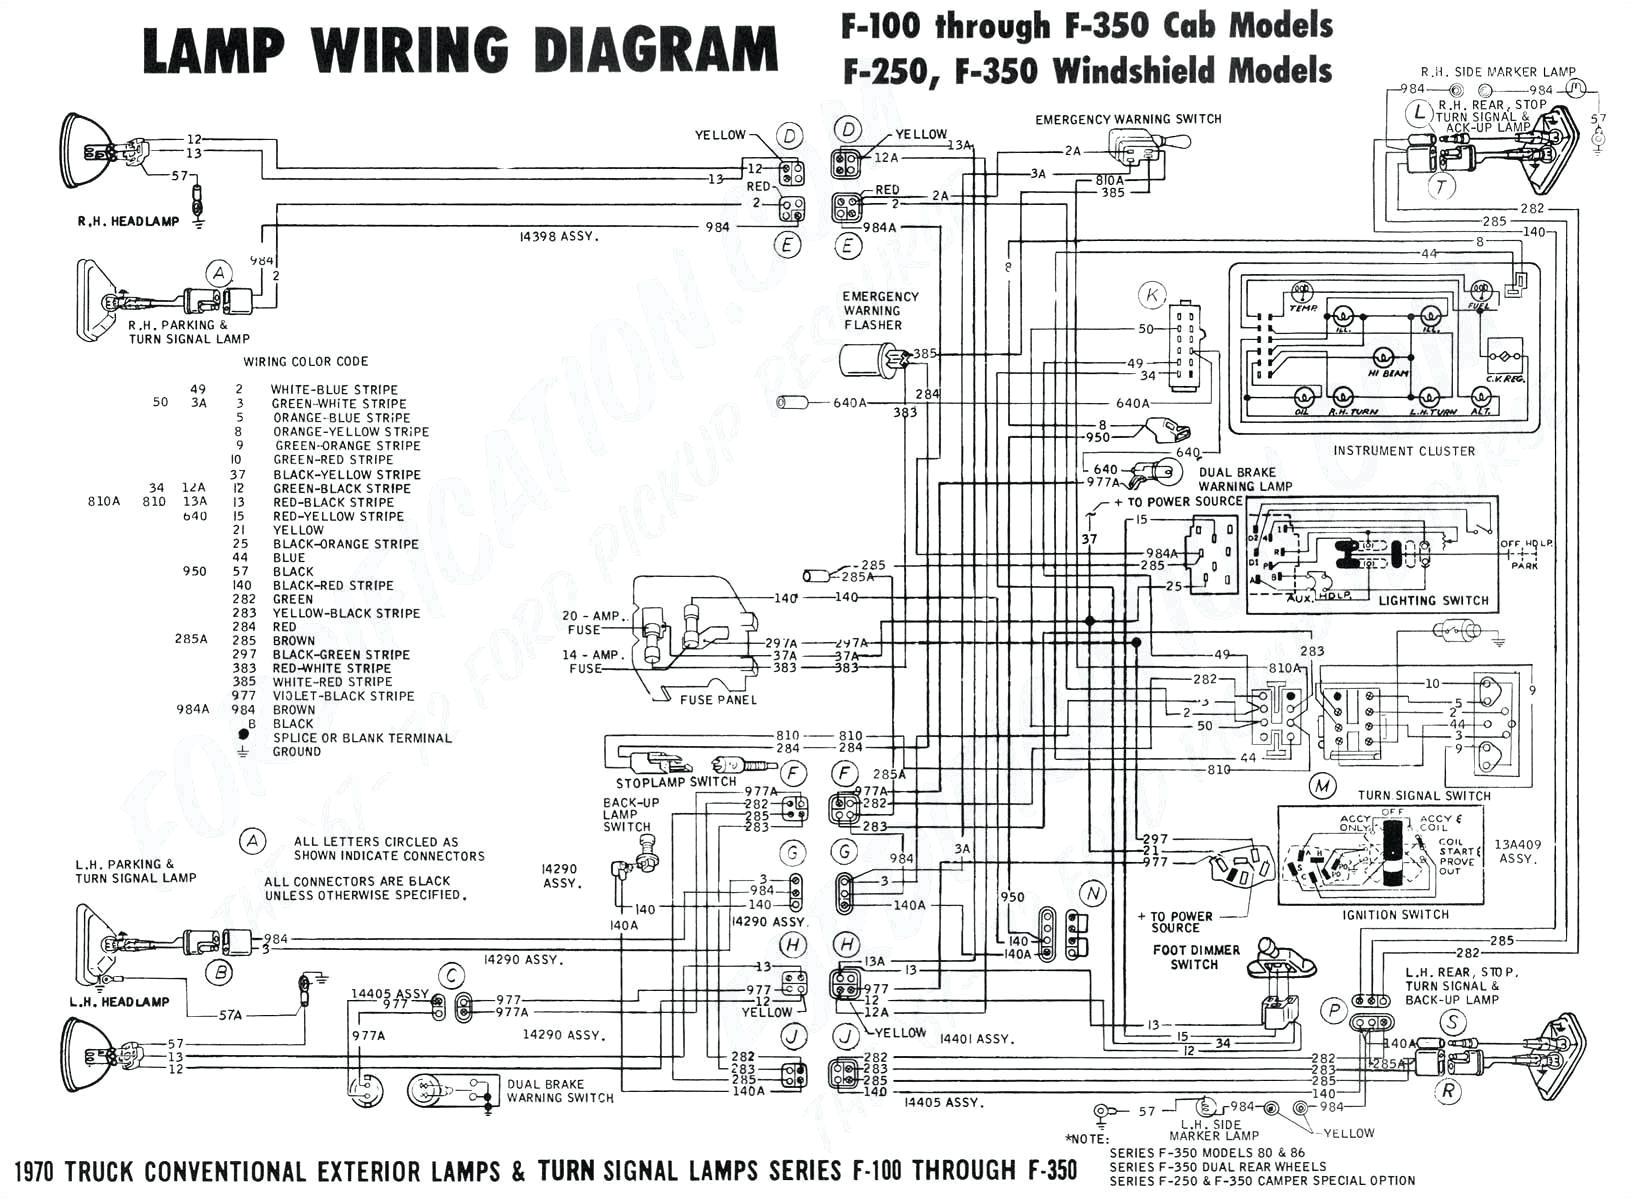 DIAGRAM] Mitsubishi Outlander 2003 User Wiring Diagram FULL Version HD  Quality Wiring Diagram - DOORBELLWIRING.LEXANESIRAC.FRdoorbellwiring.lexanesirac.fr